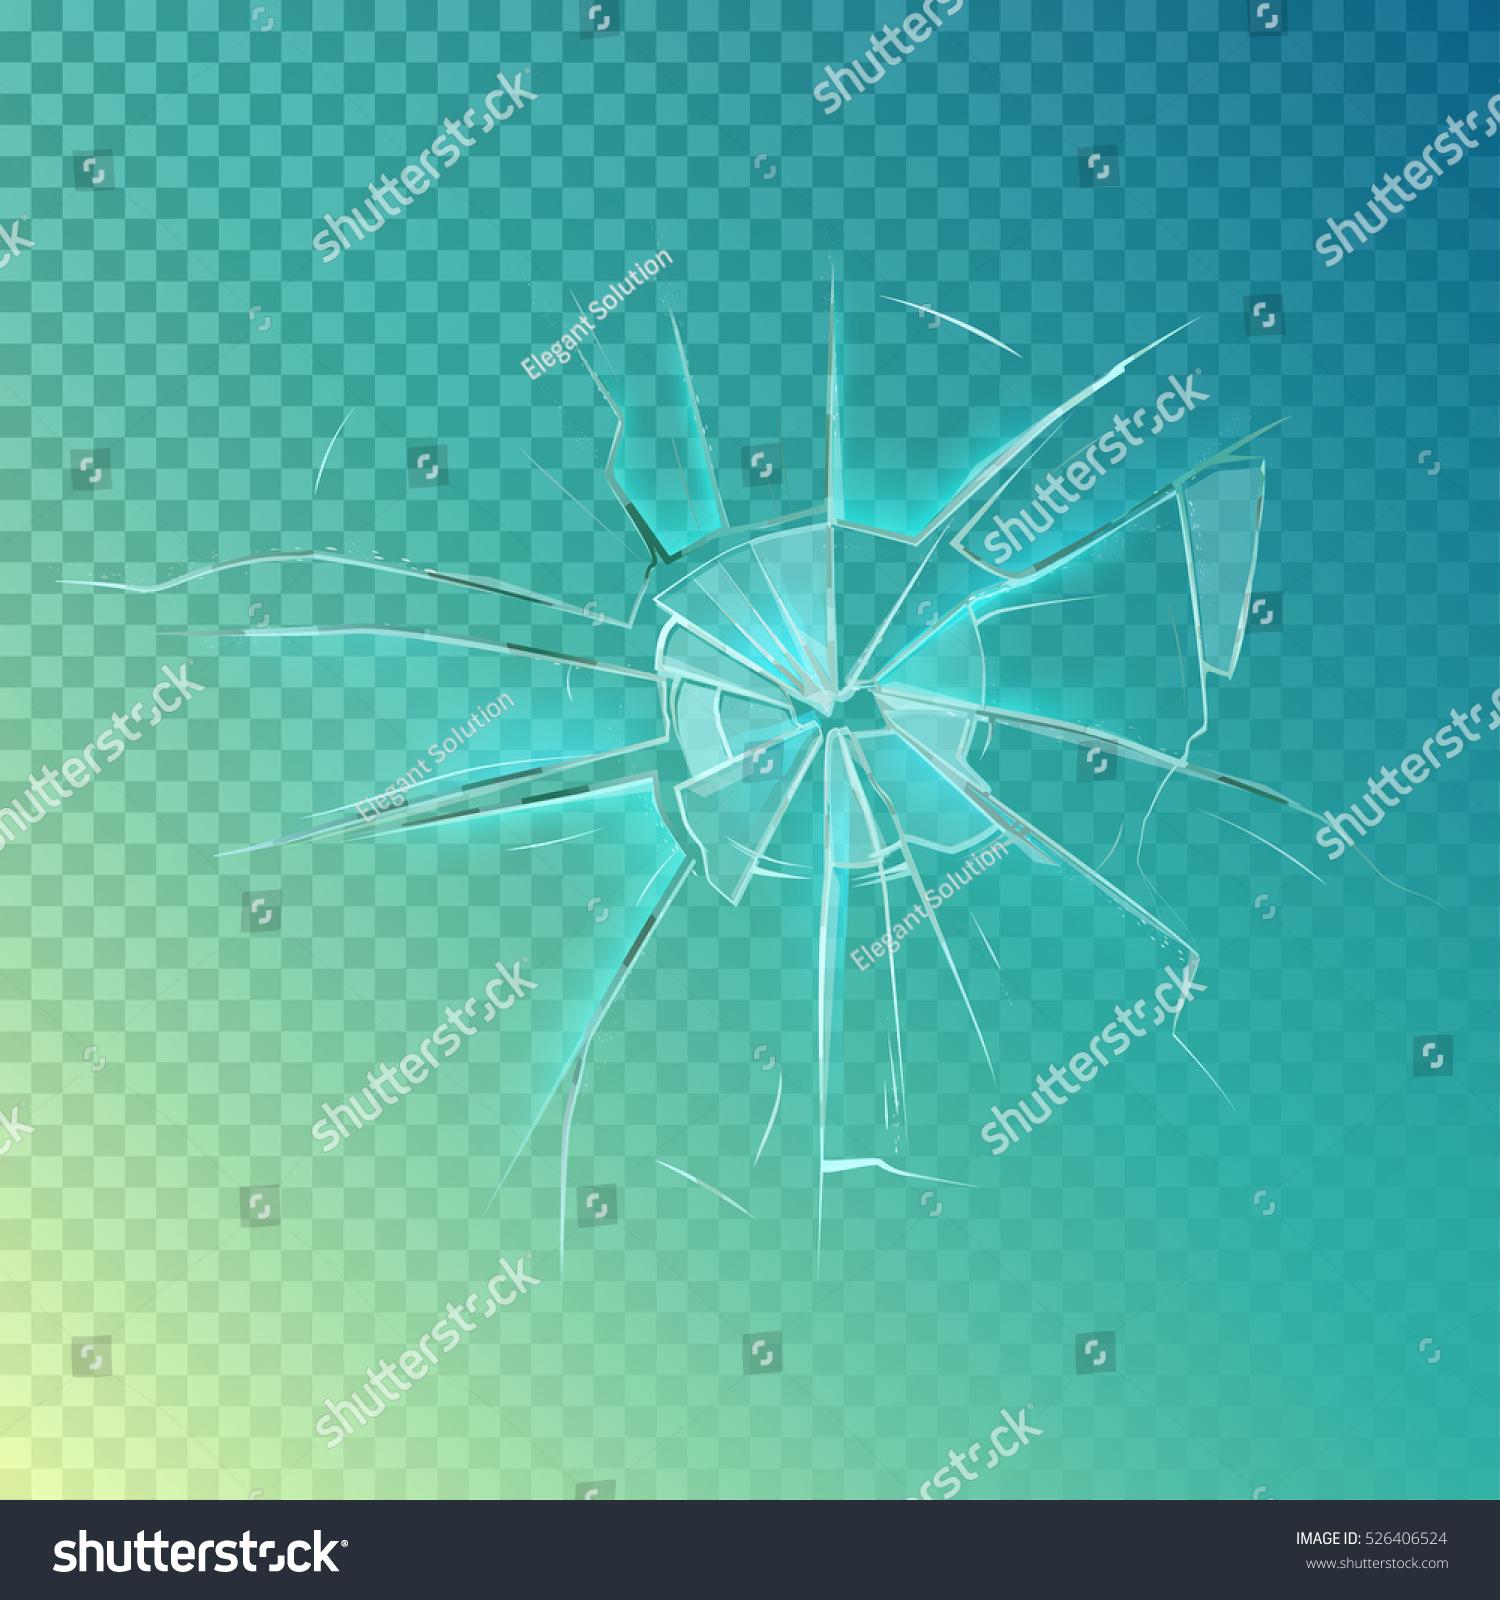 glass crack music